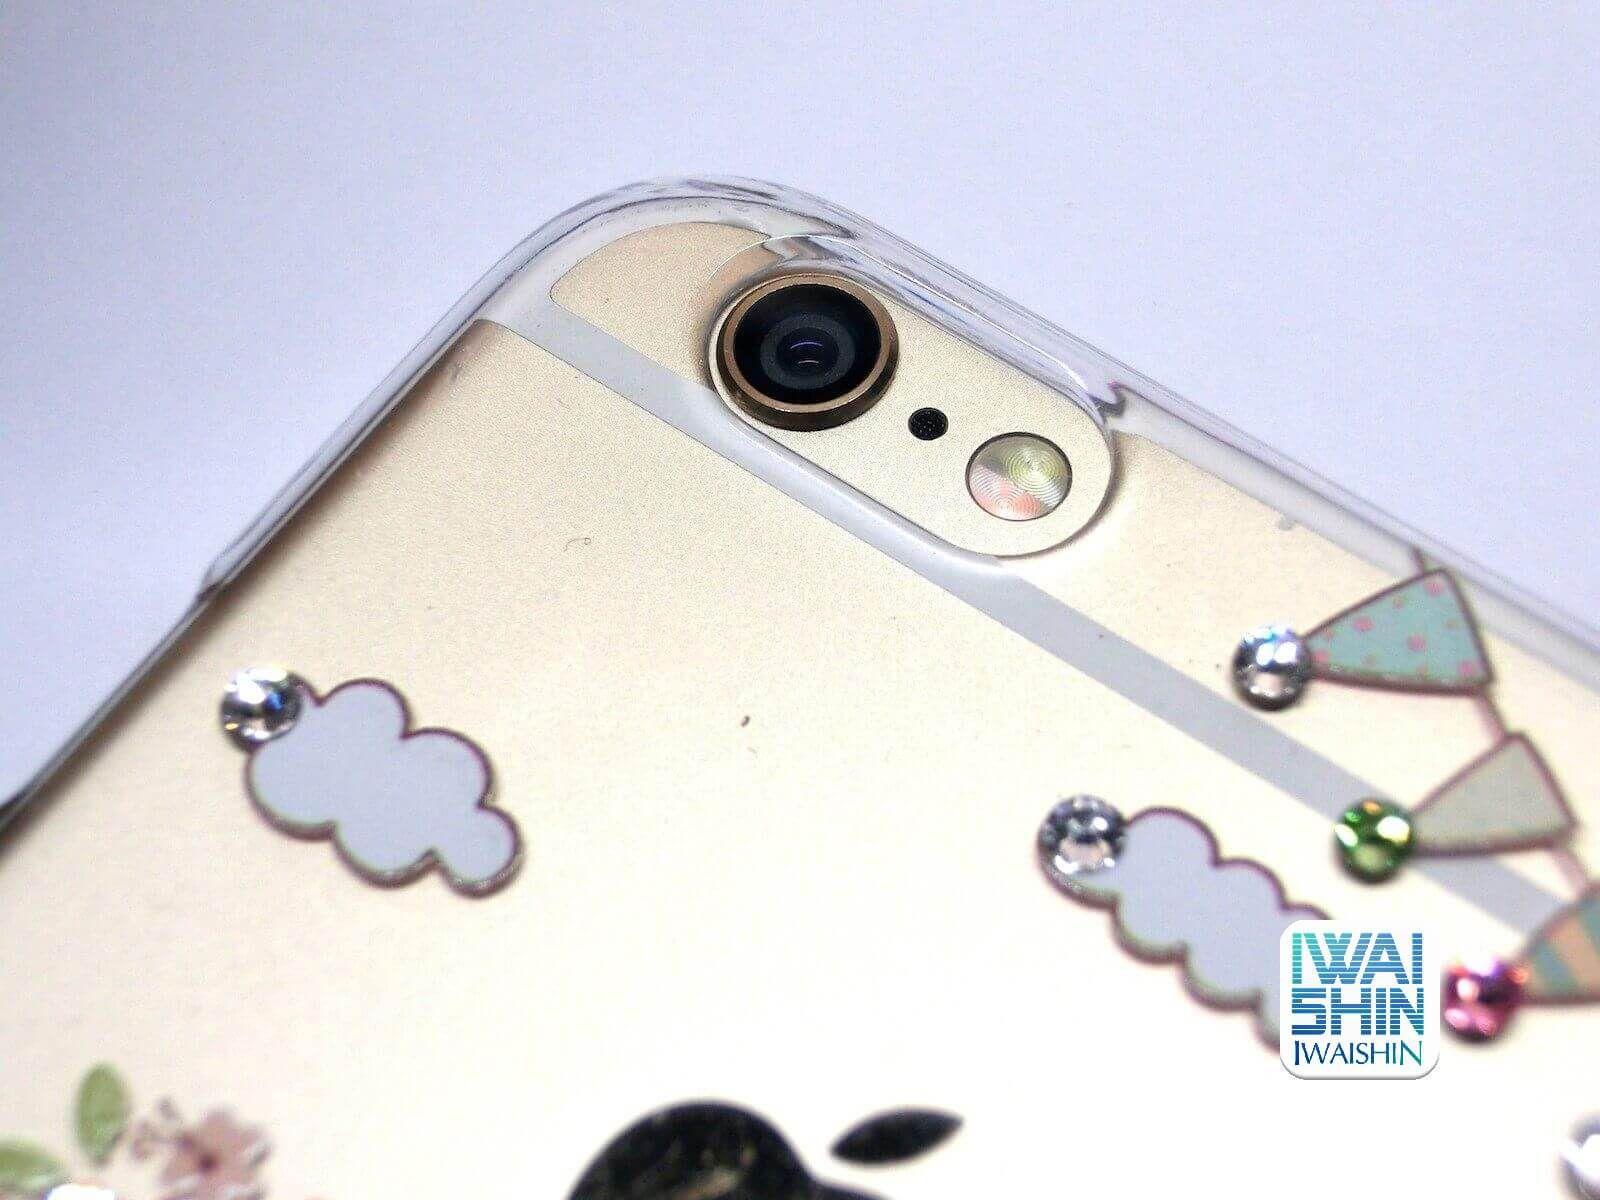 APBS 施華洛世奇 IPhone 6 保護殼5749